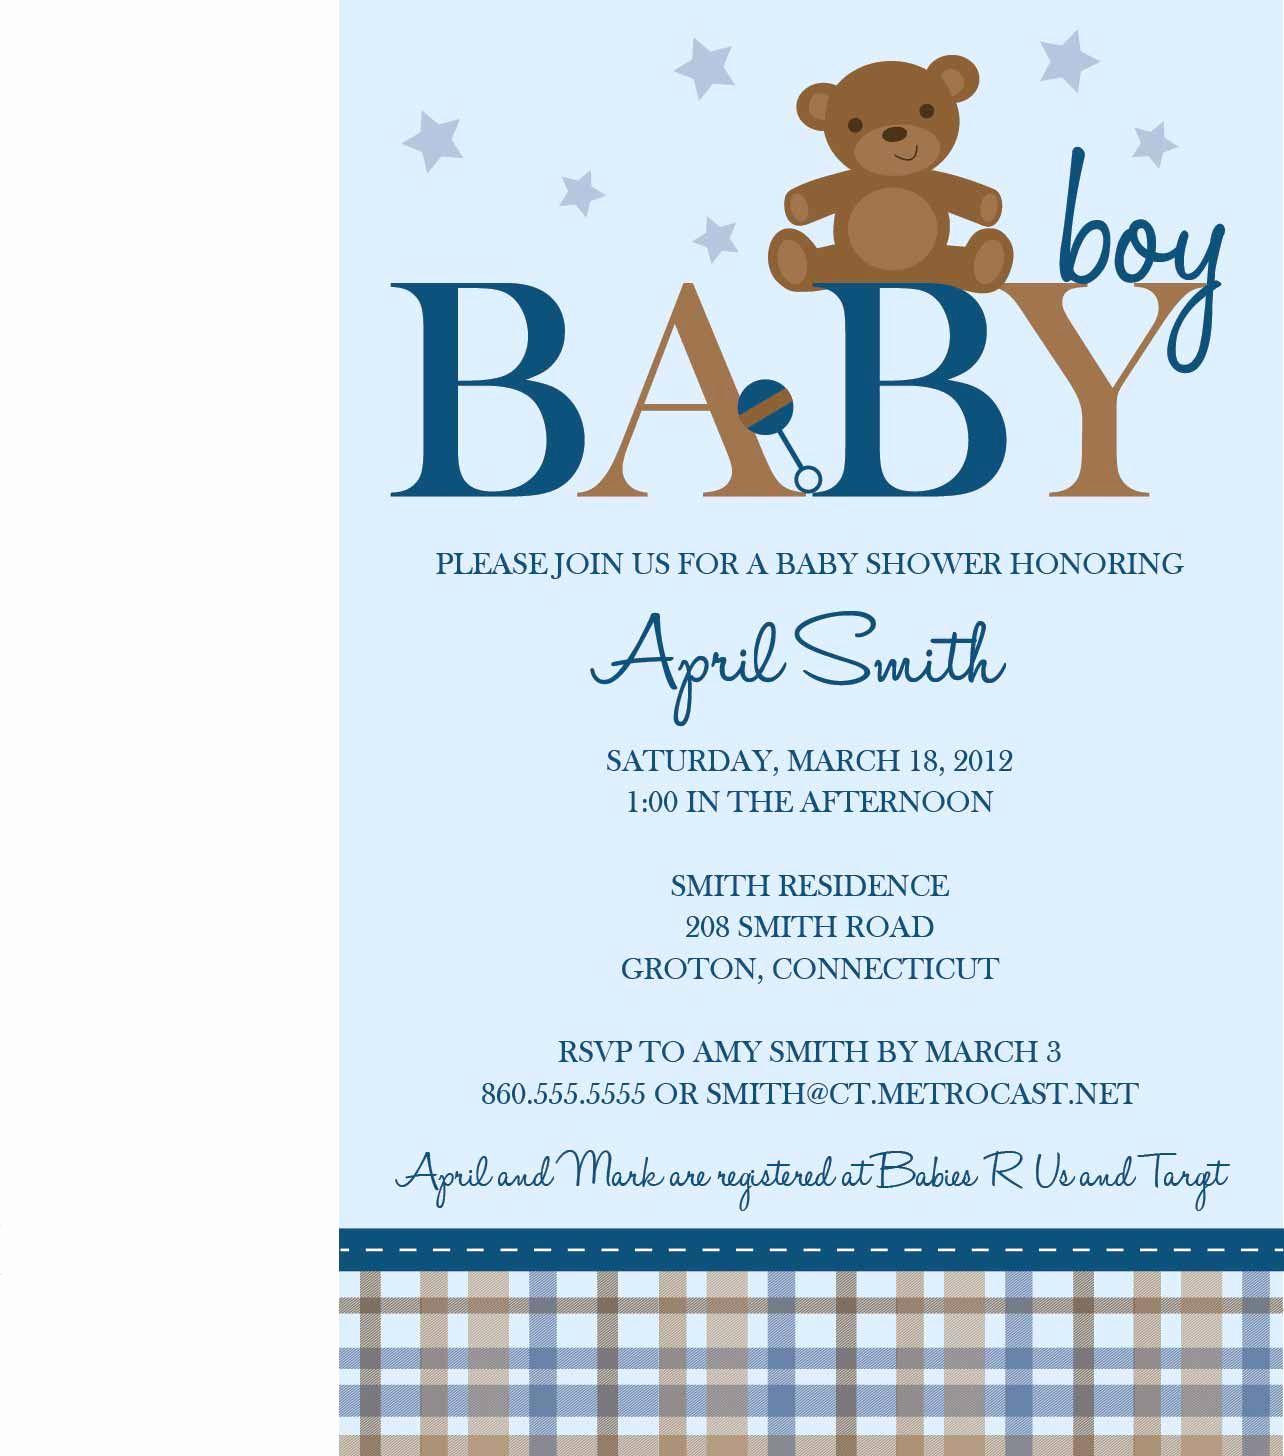 Baby Boy Shower Invitation Ideas Beautiful Teddy Bear Baby Shower Templates